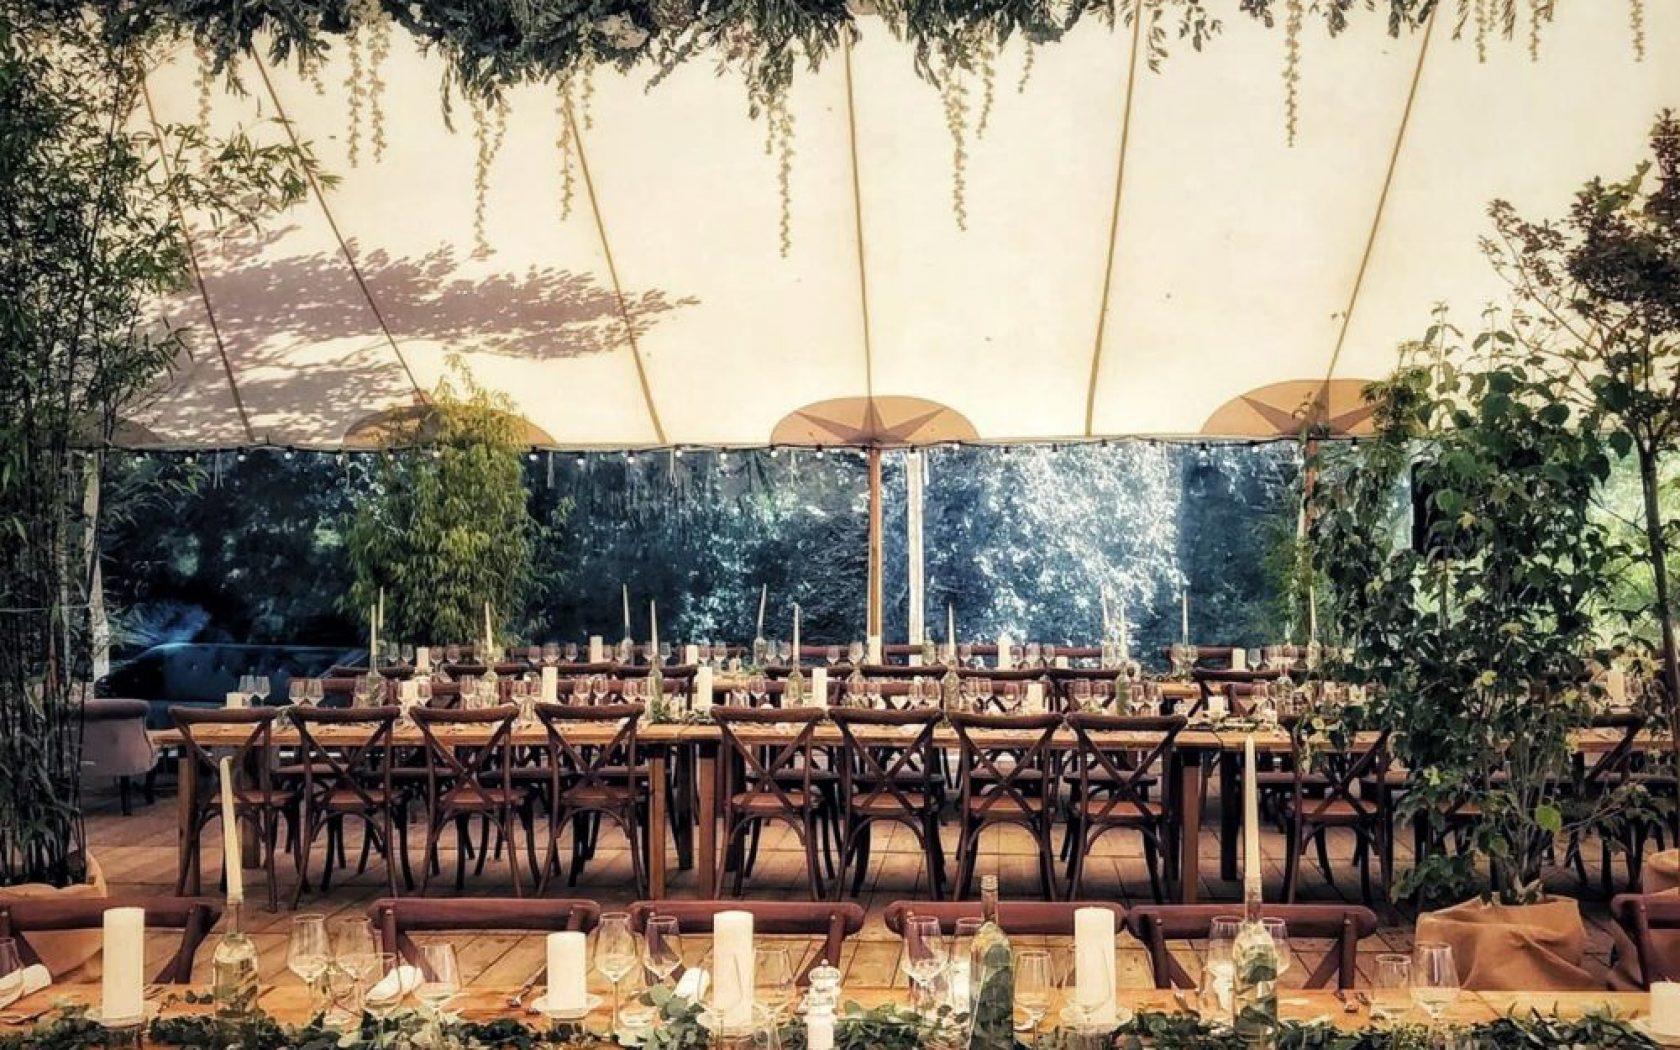 decoration-mariage-normandie-ambiance-vegetale-scenographie-mariage-decoration-tente-de-reception-mariage